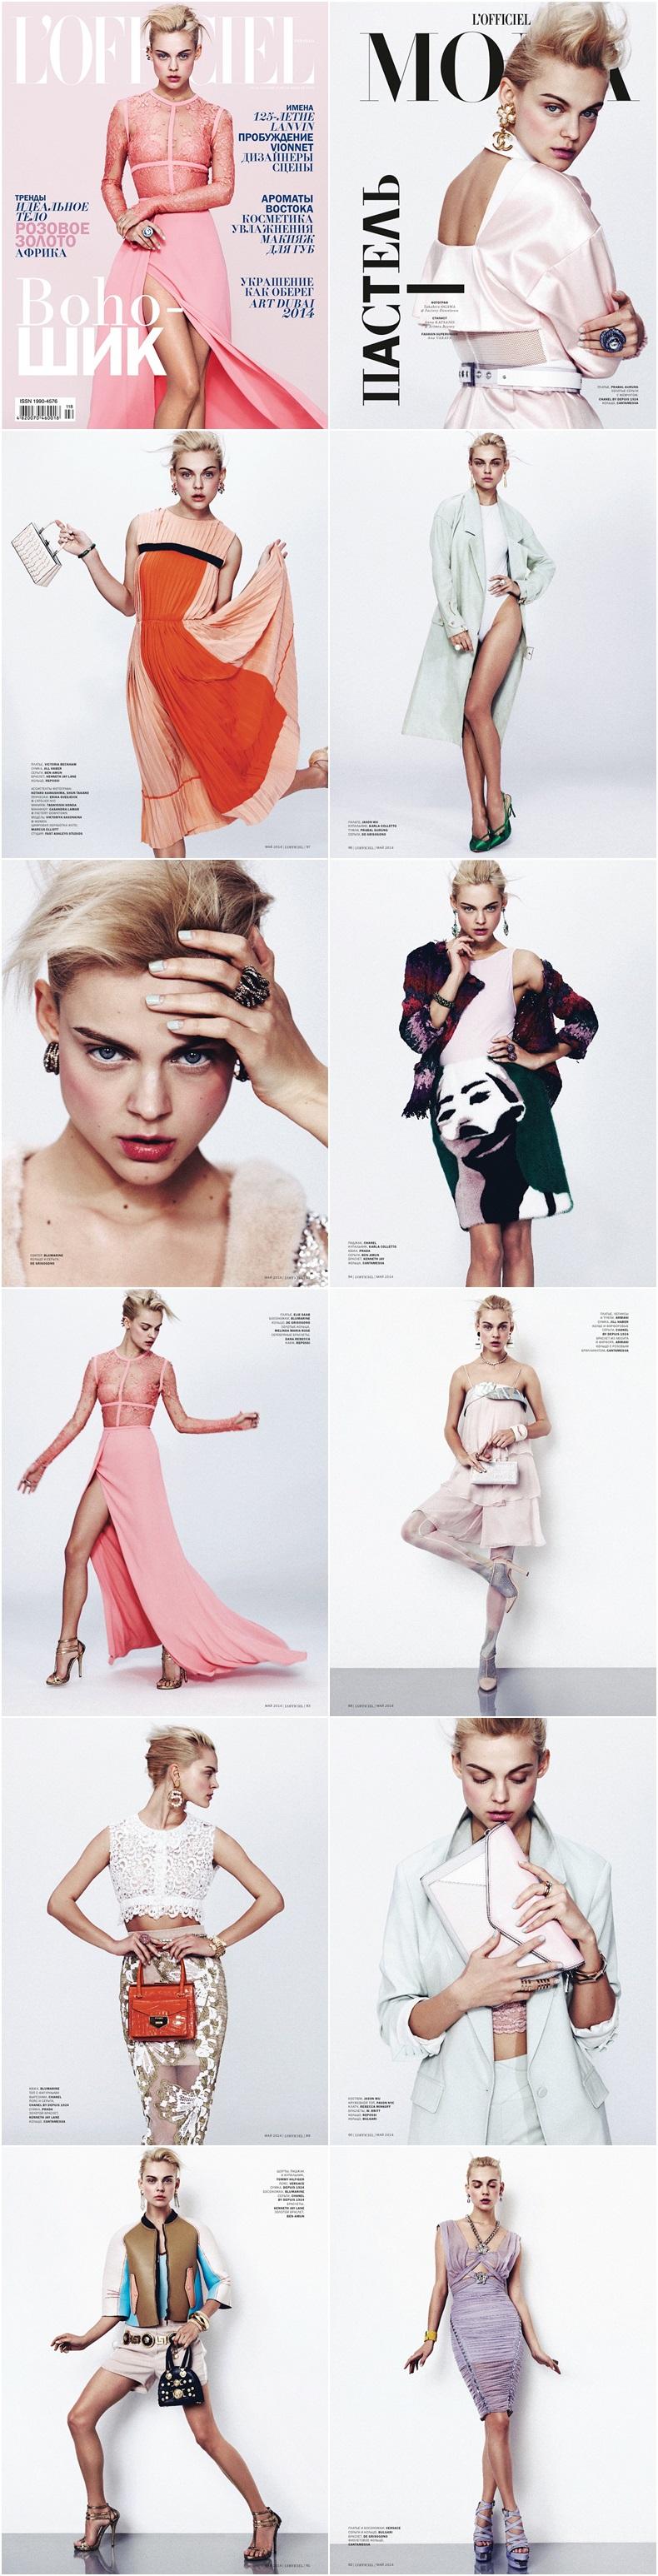 fashion4addicts-com